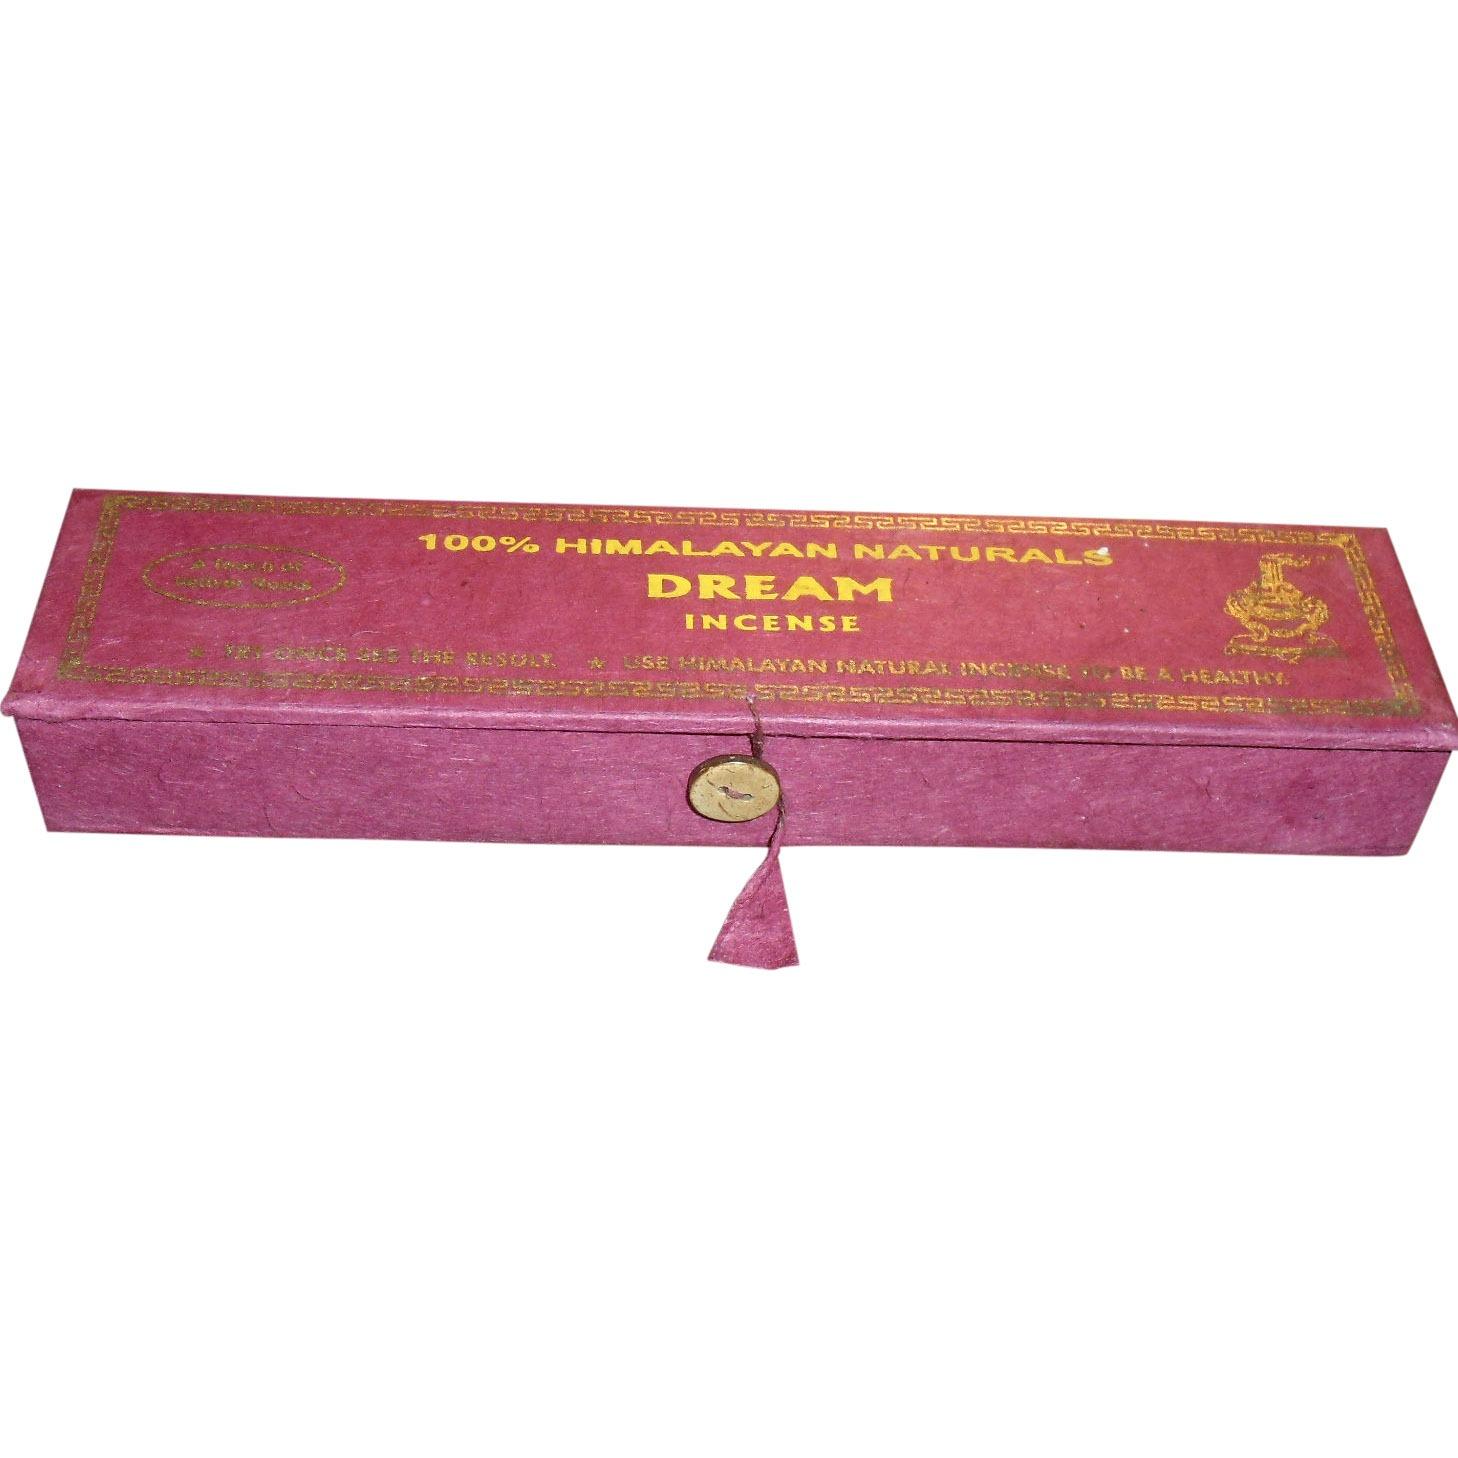 Tibetan Dream Incense